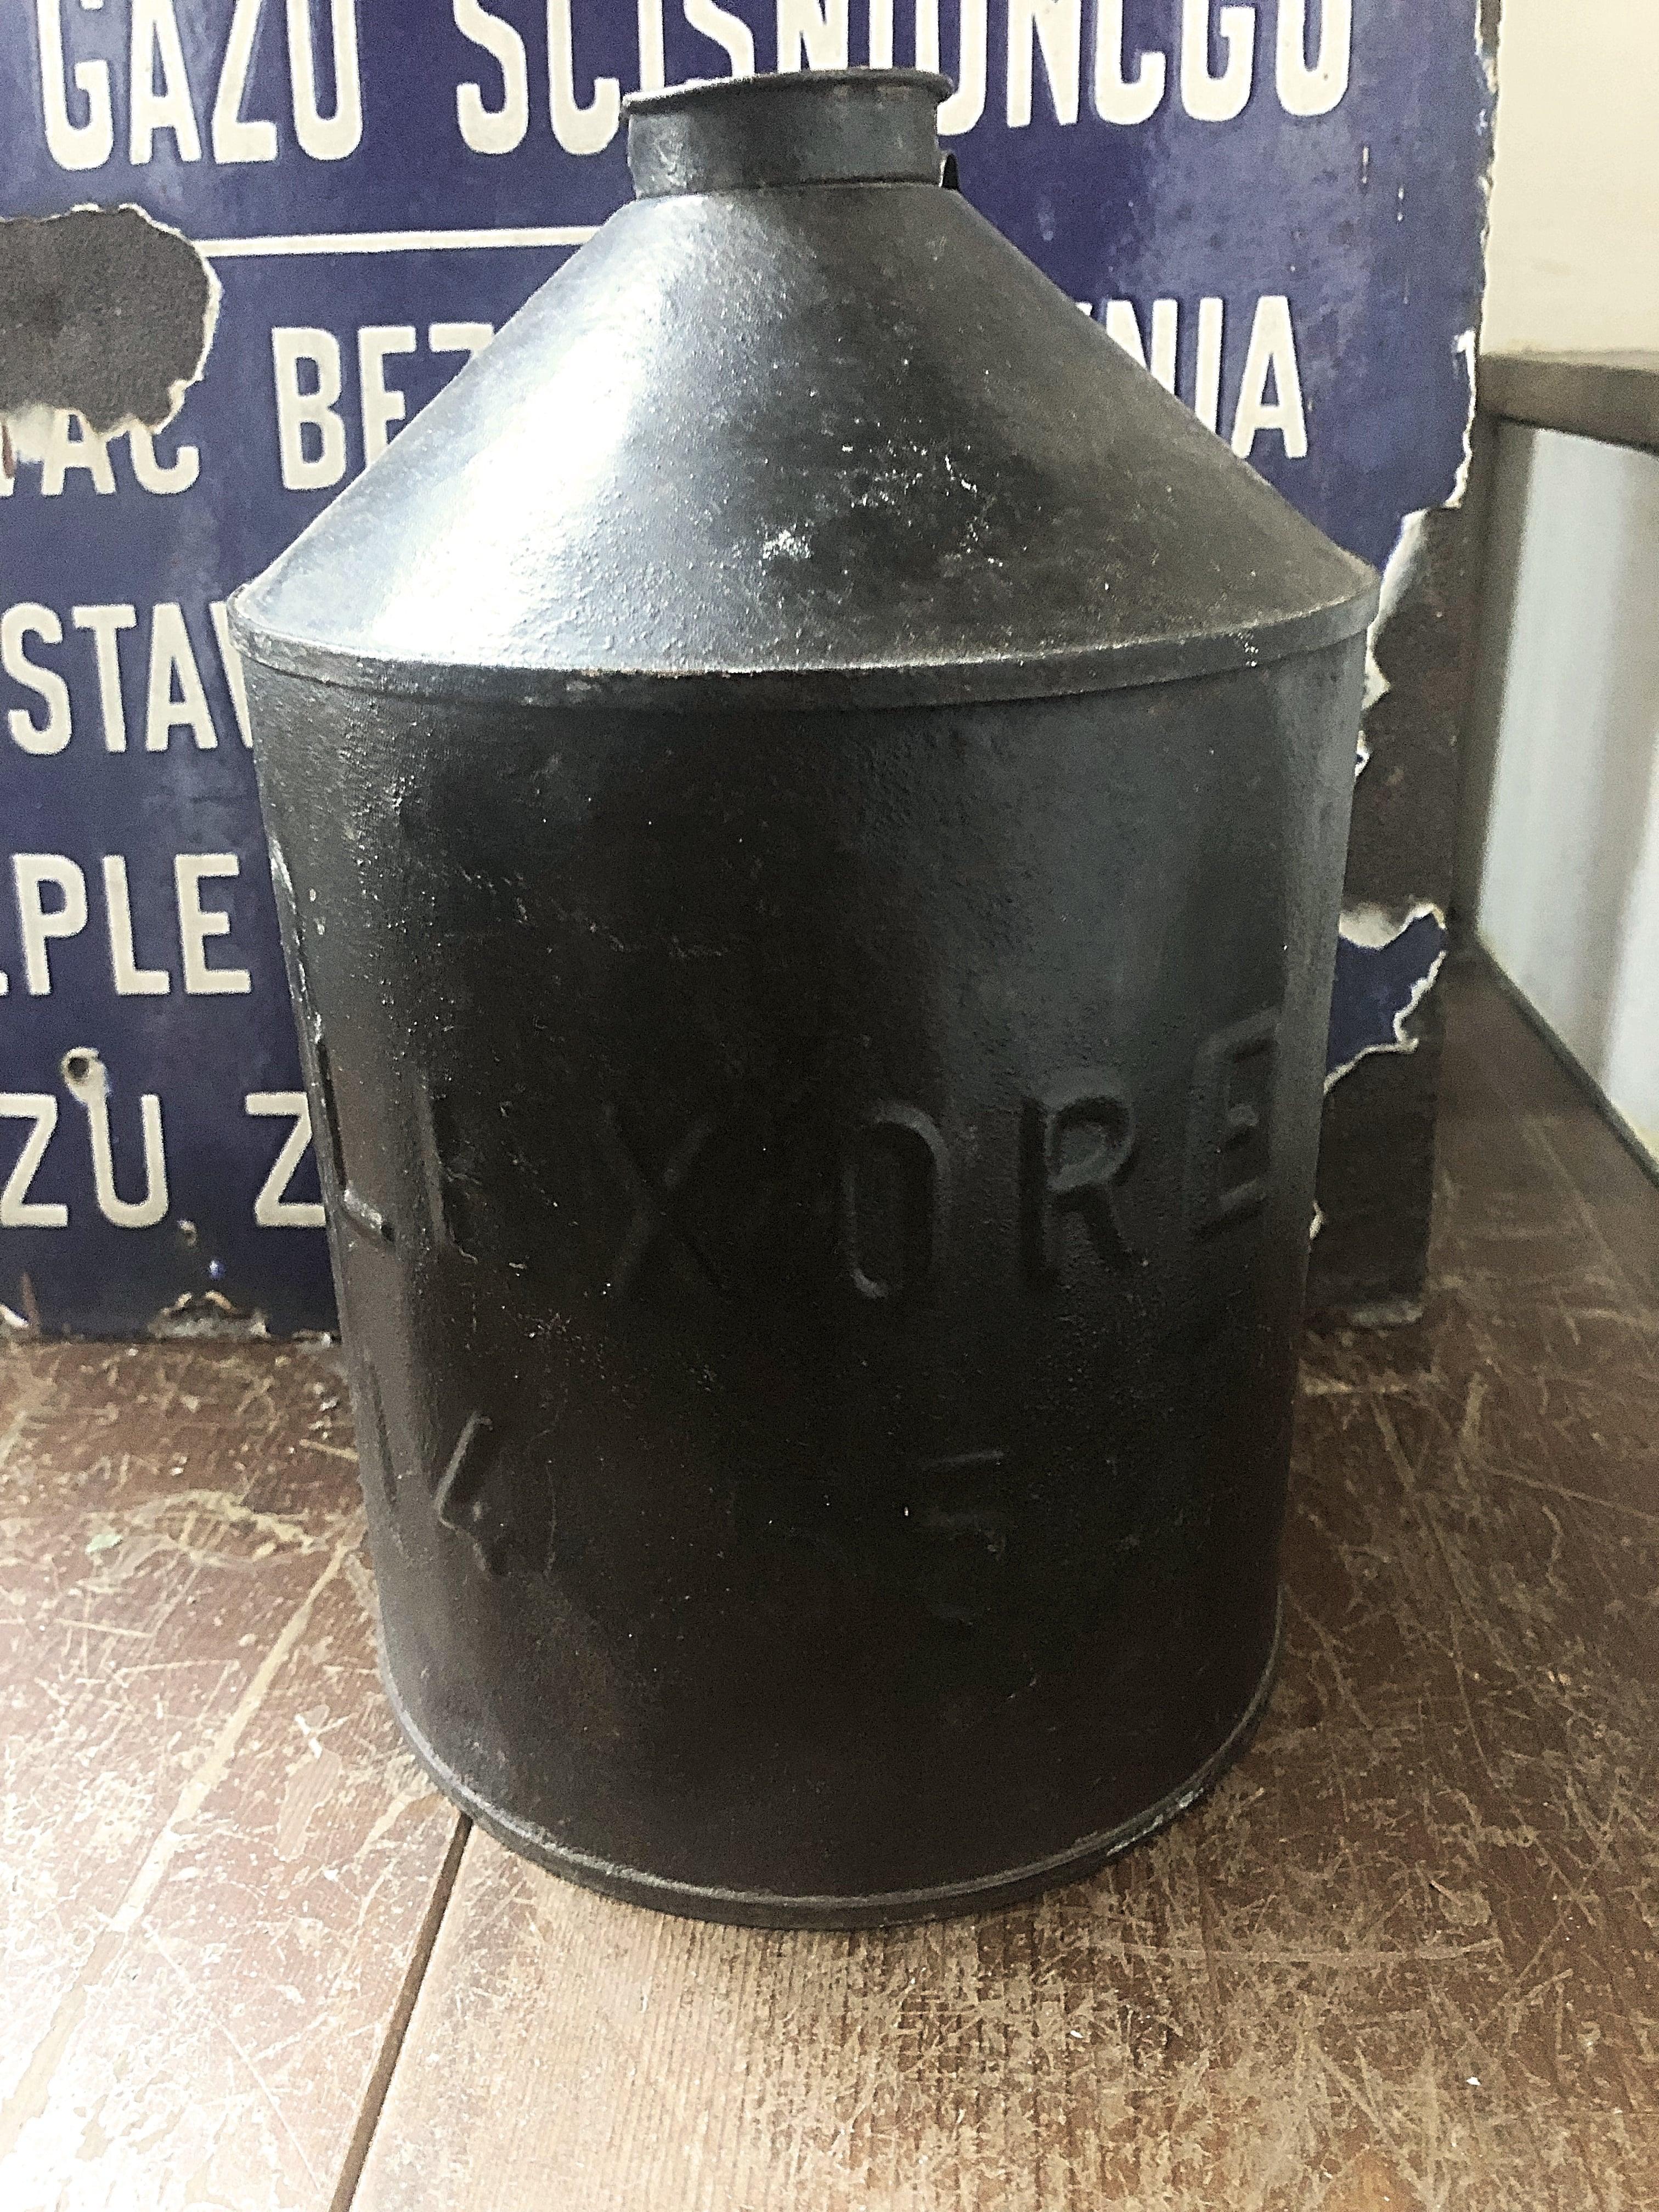 SILEXORE1455 ブリキ缶